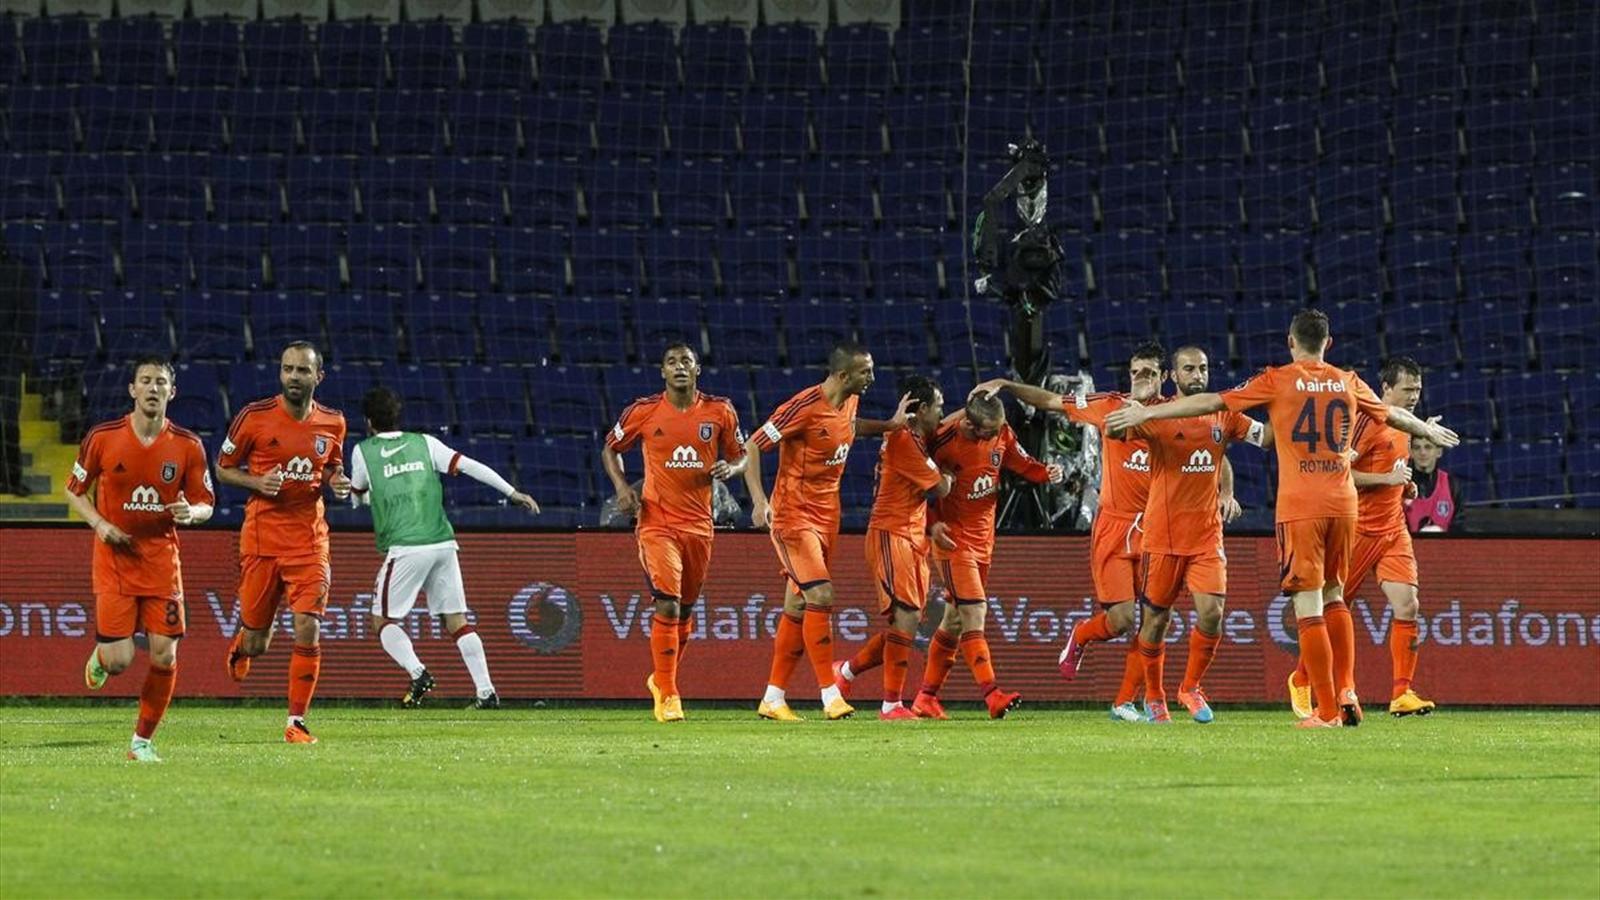 Video: İstanbul Basaksehir vs Galatasaray